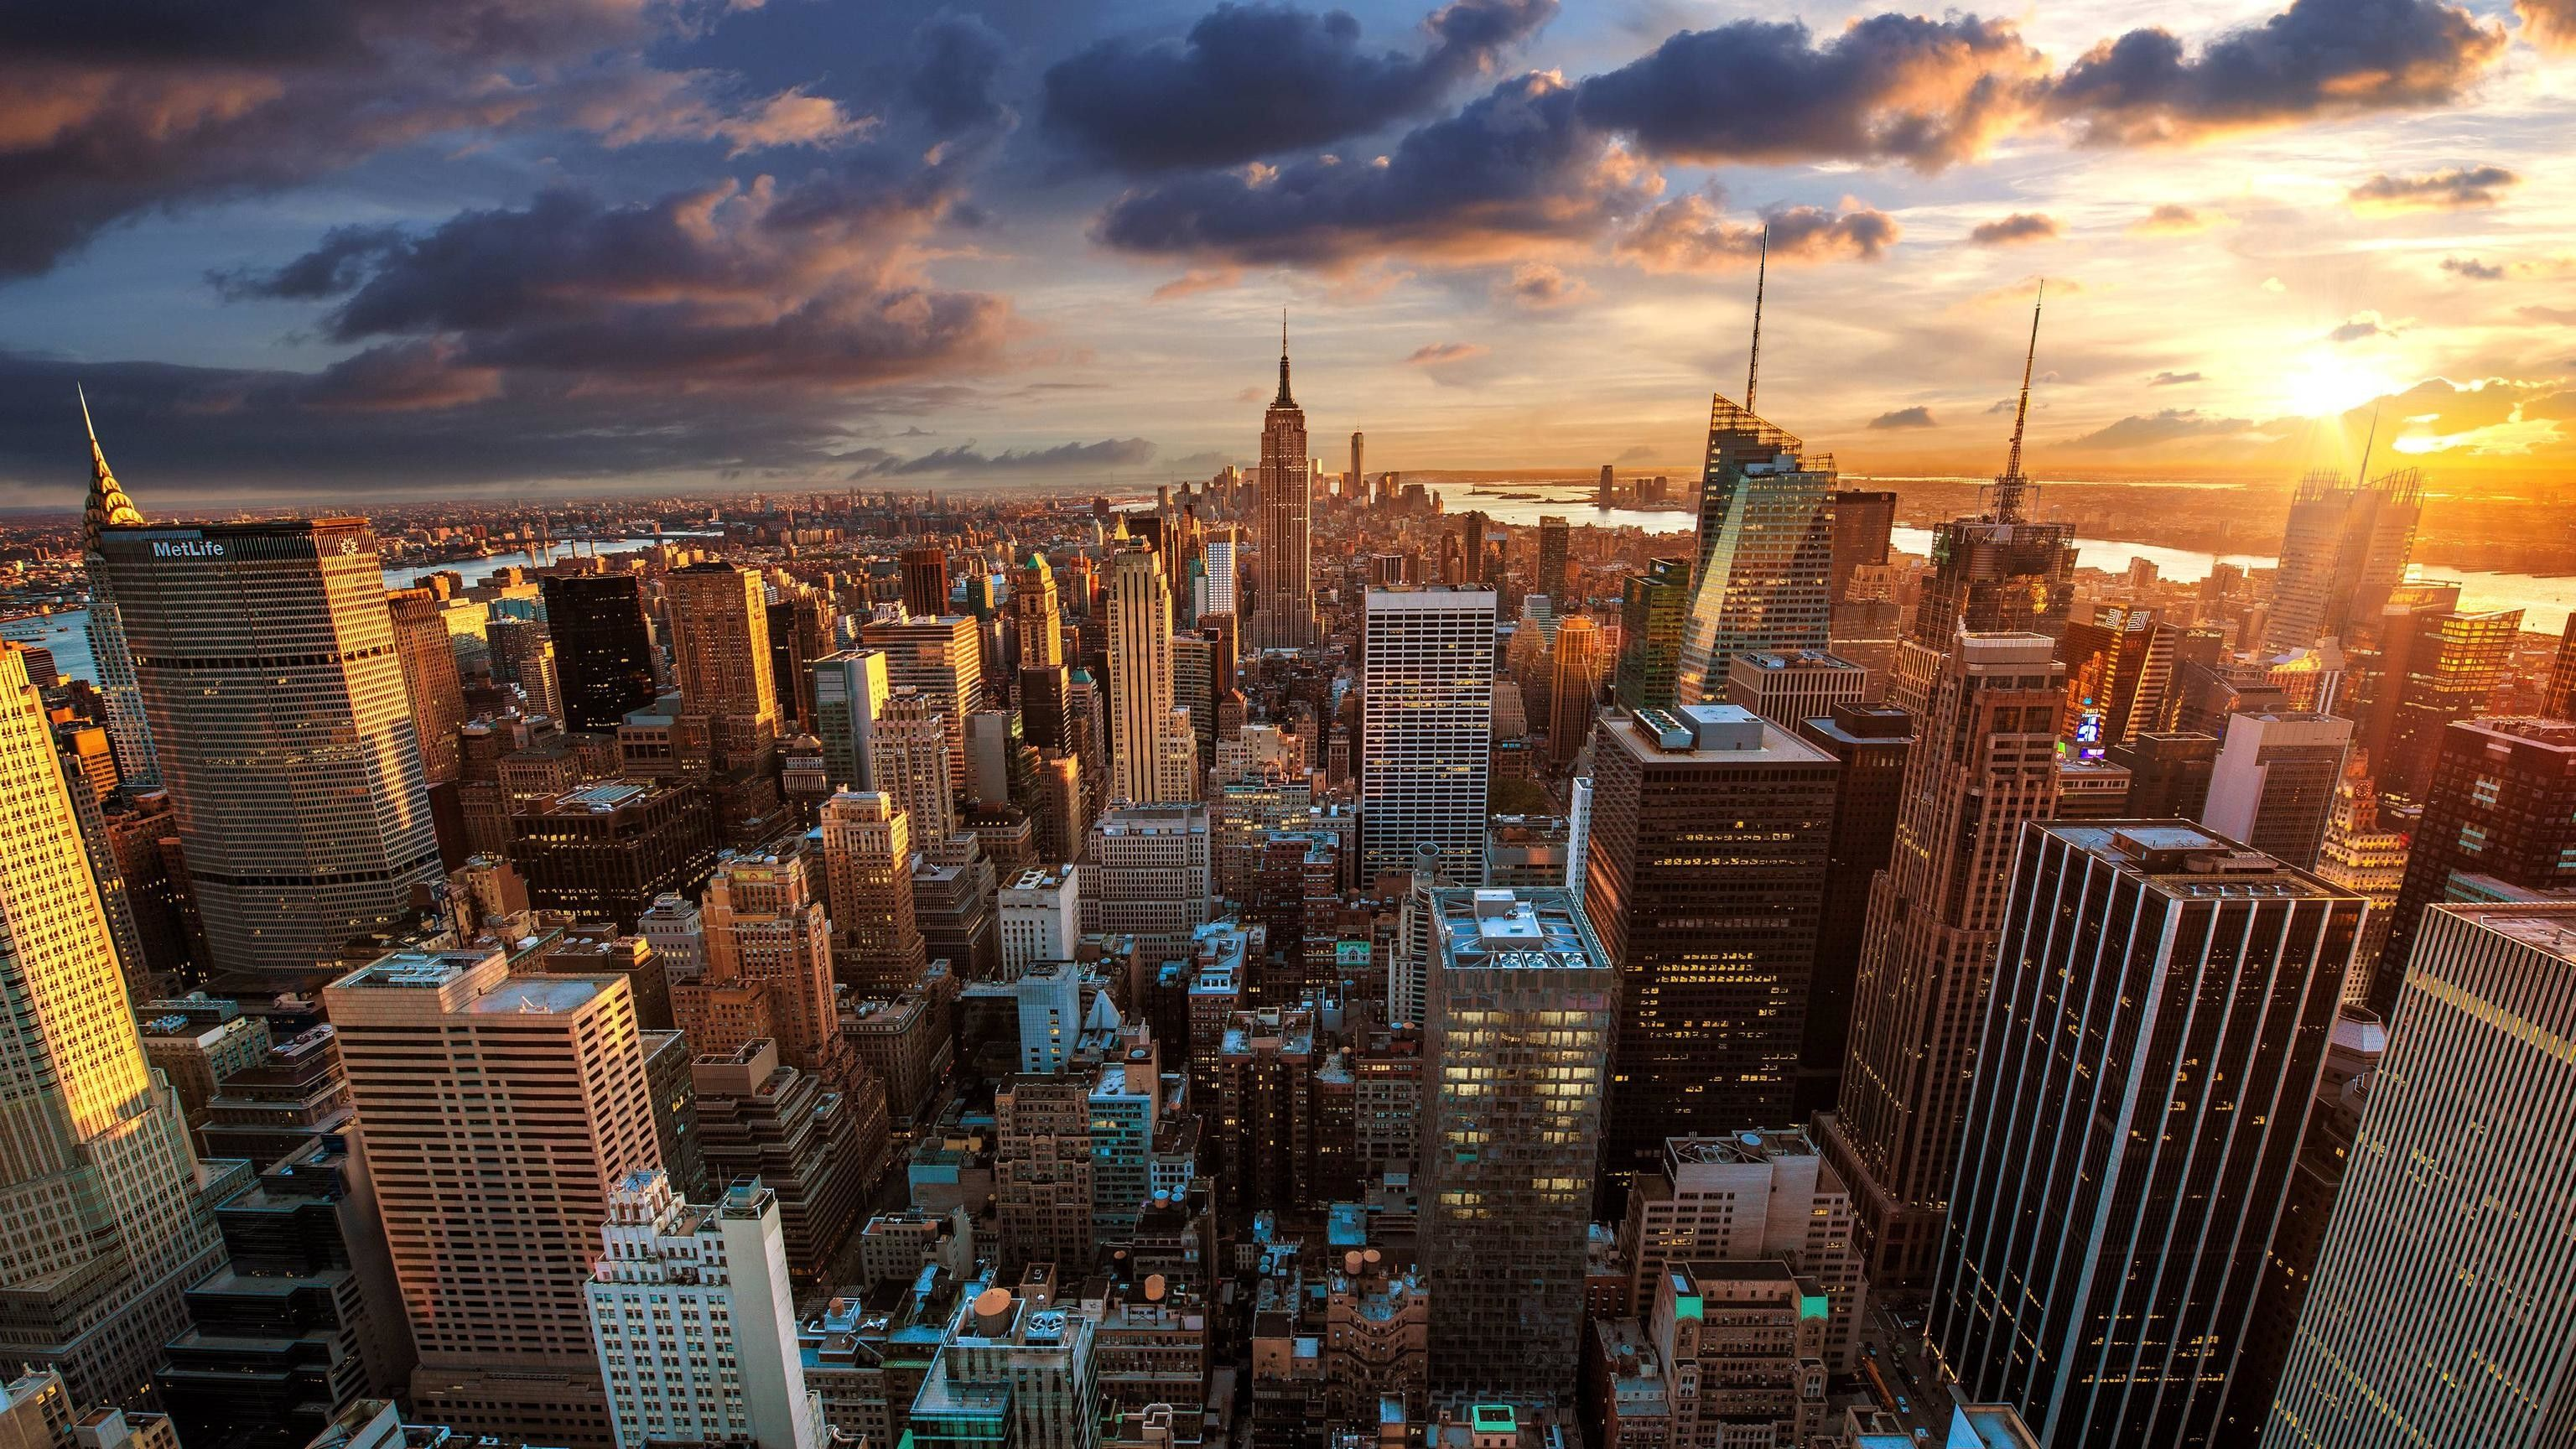 New York City 4K Wallpapers 3072x1728